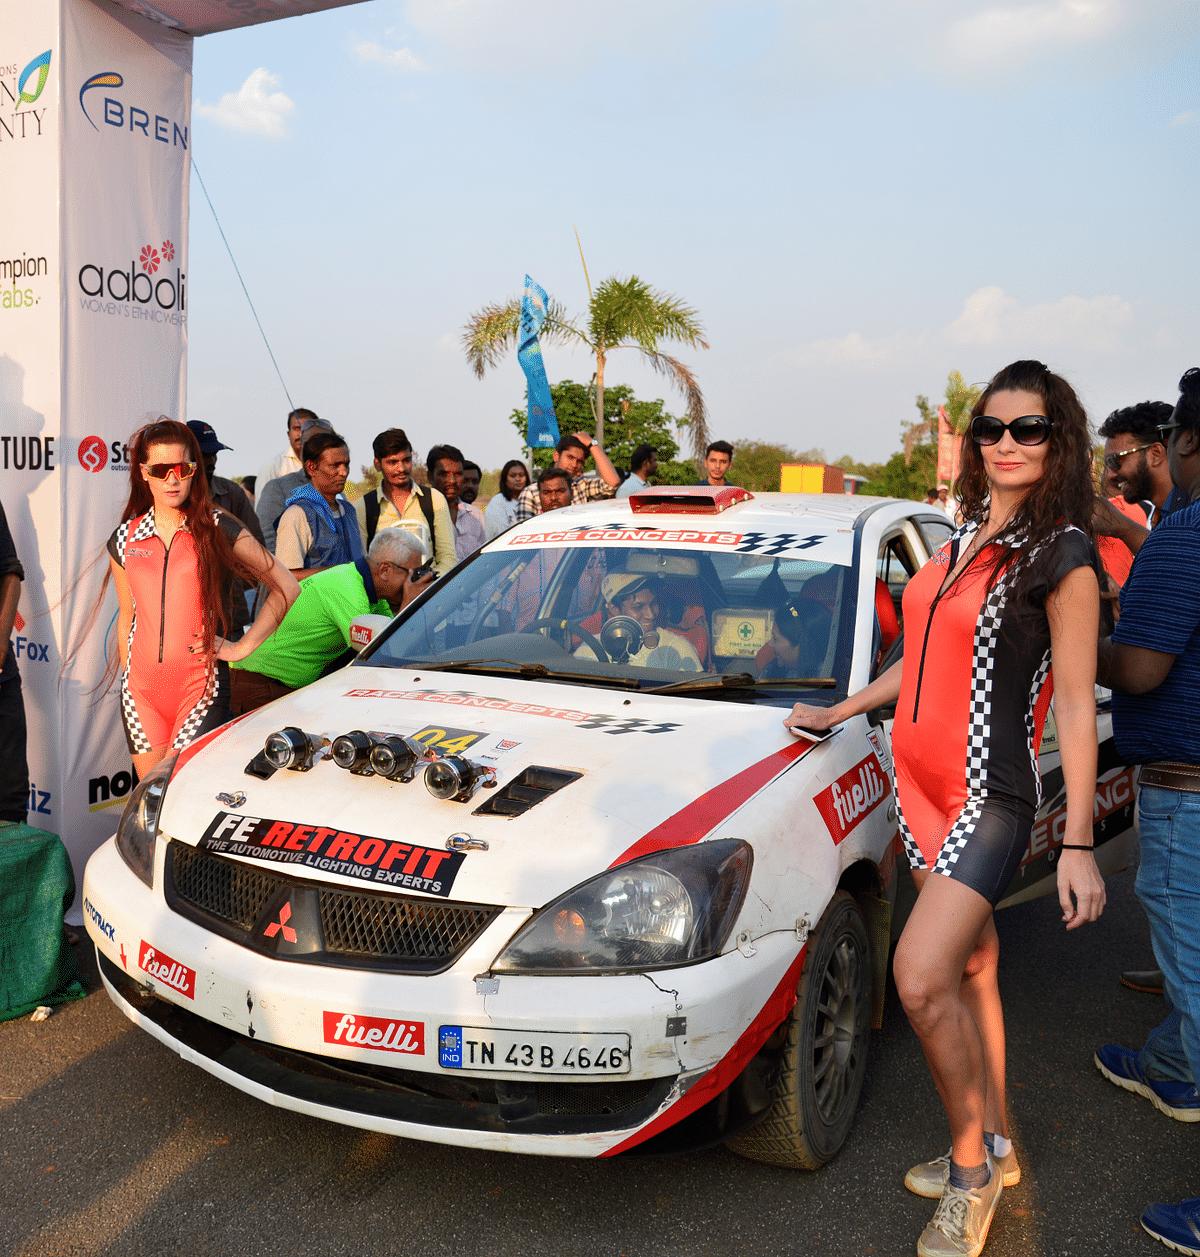 Sprint de Bengaluru 2019 – Younus Ilyas takes early lead